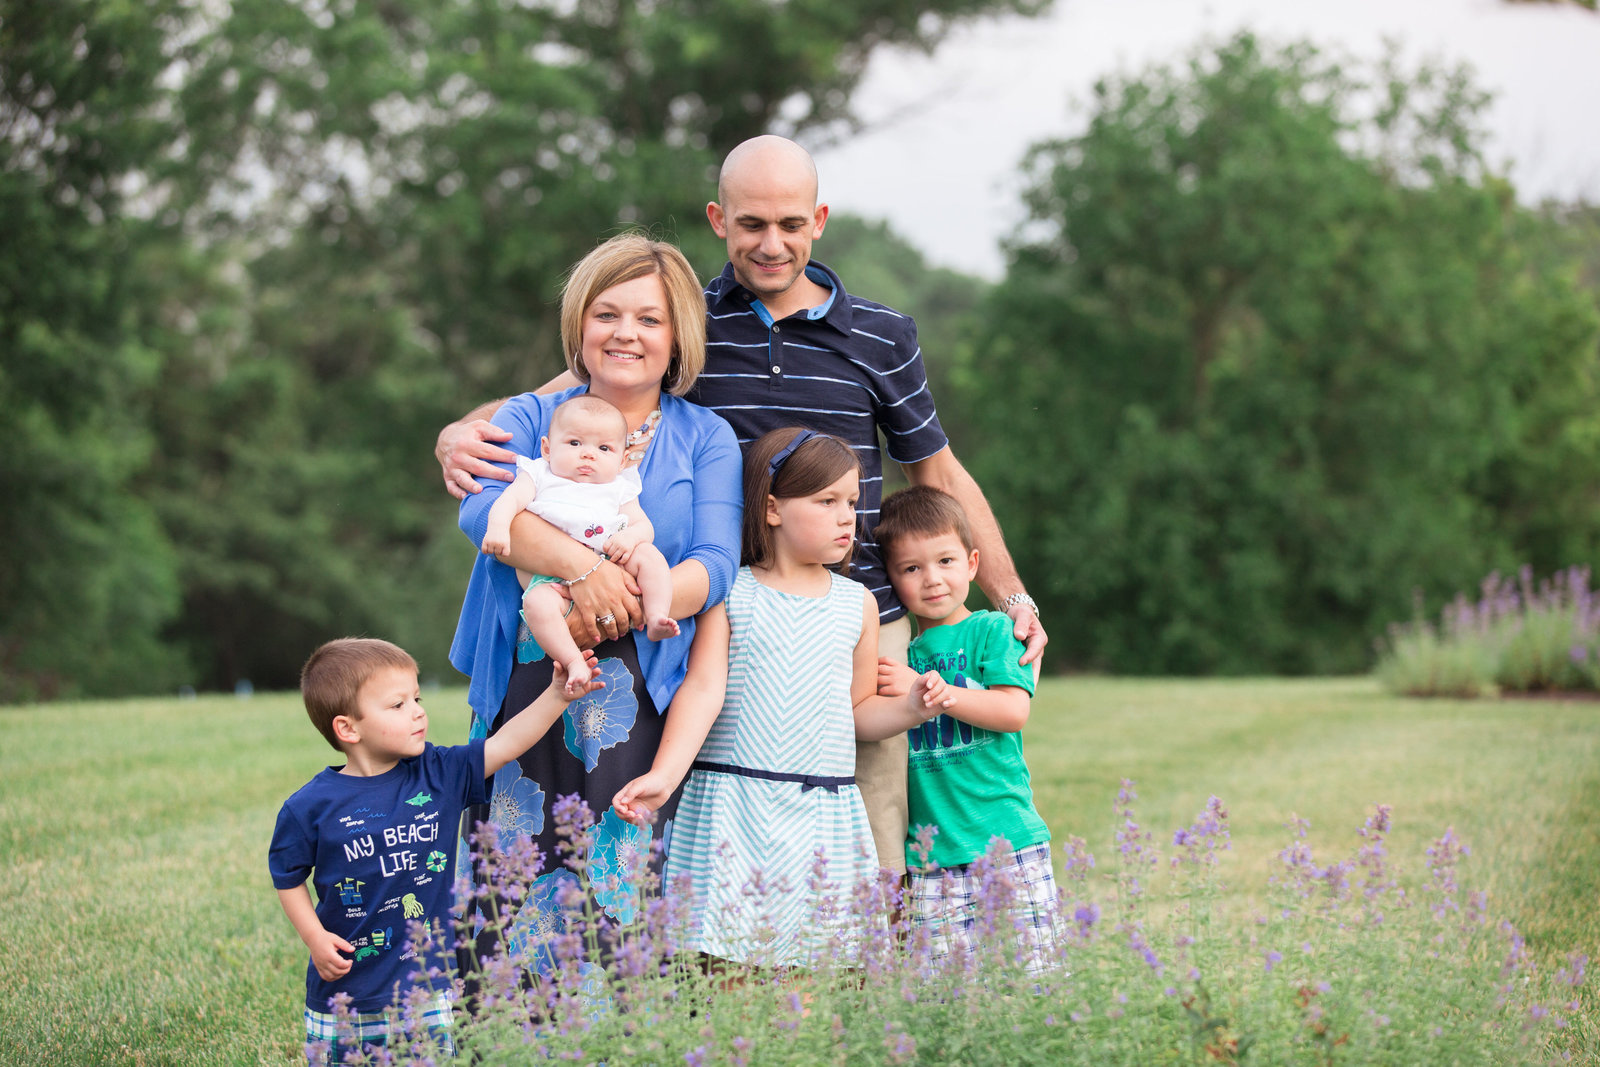 northern va washington dc family photographer dc baby maternity motherhood photographer (15)